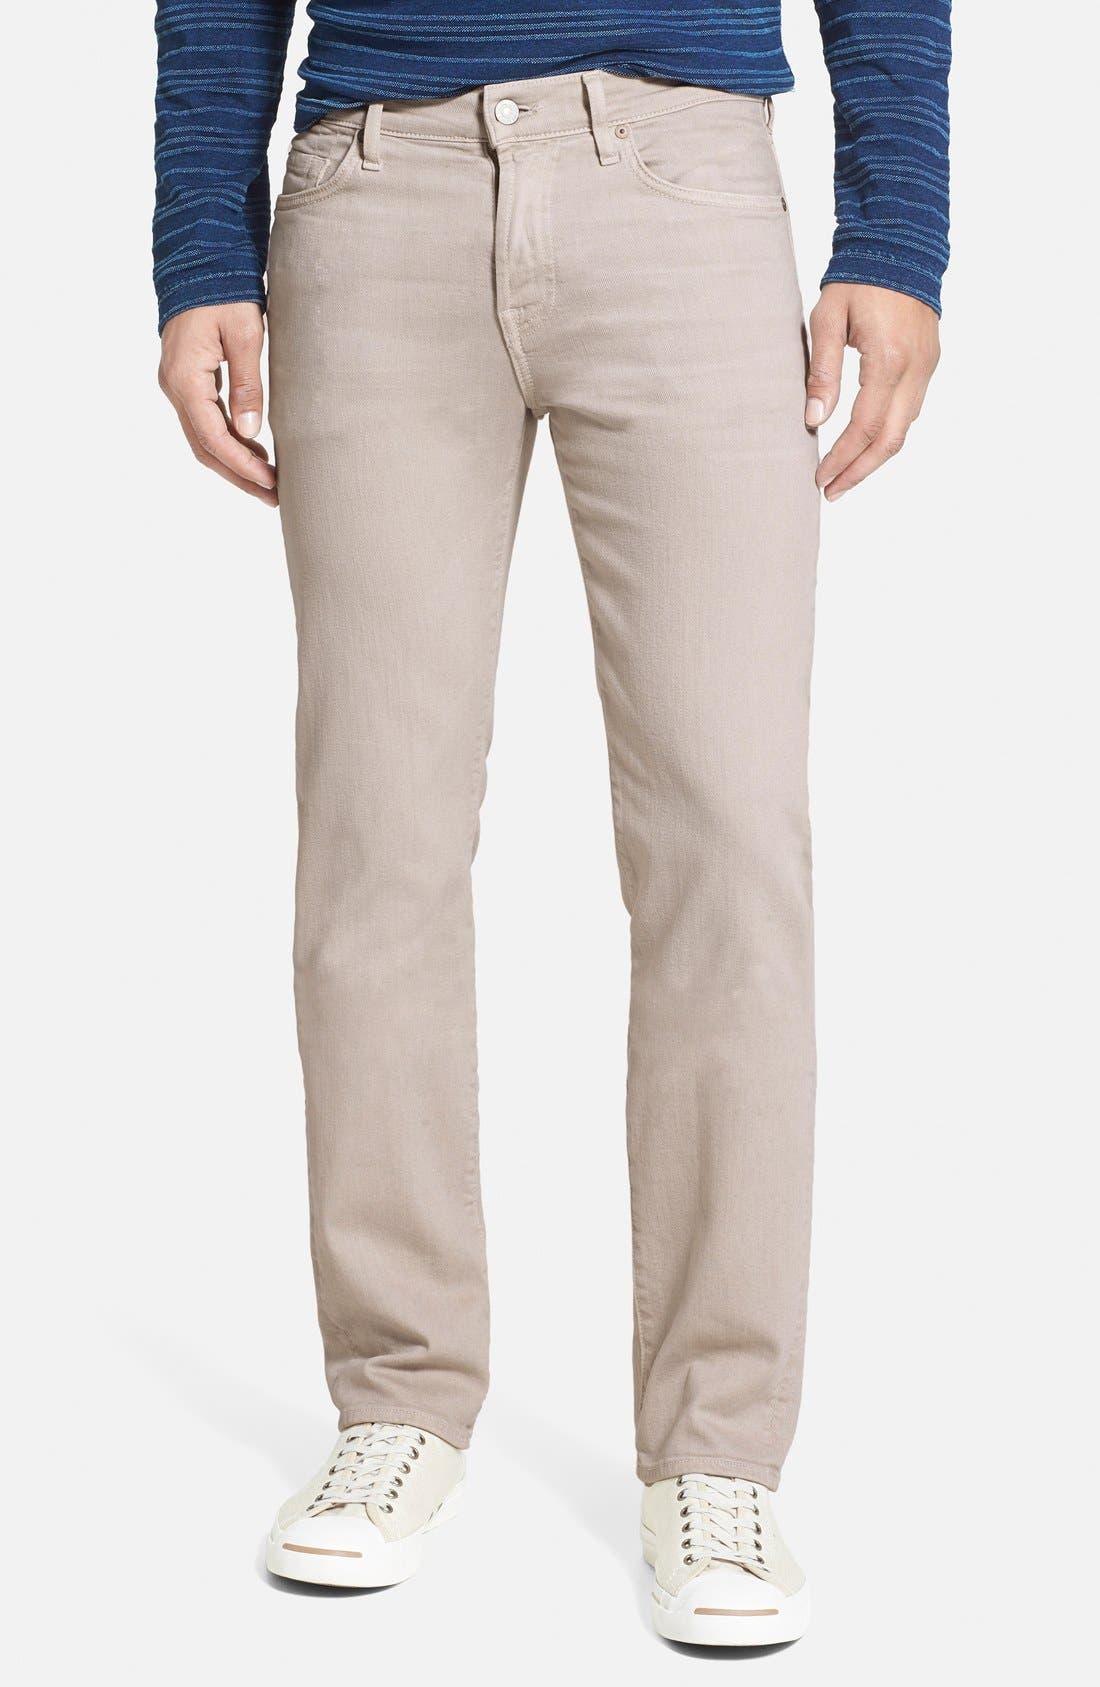 'Slimmy - Luxe Performance' Slim Fit Jeans,                         Main,                         color, Light Khaki